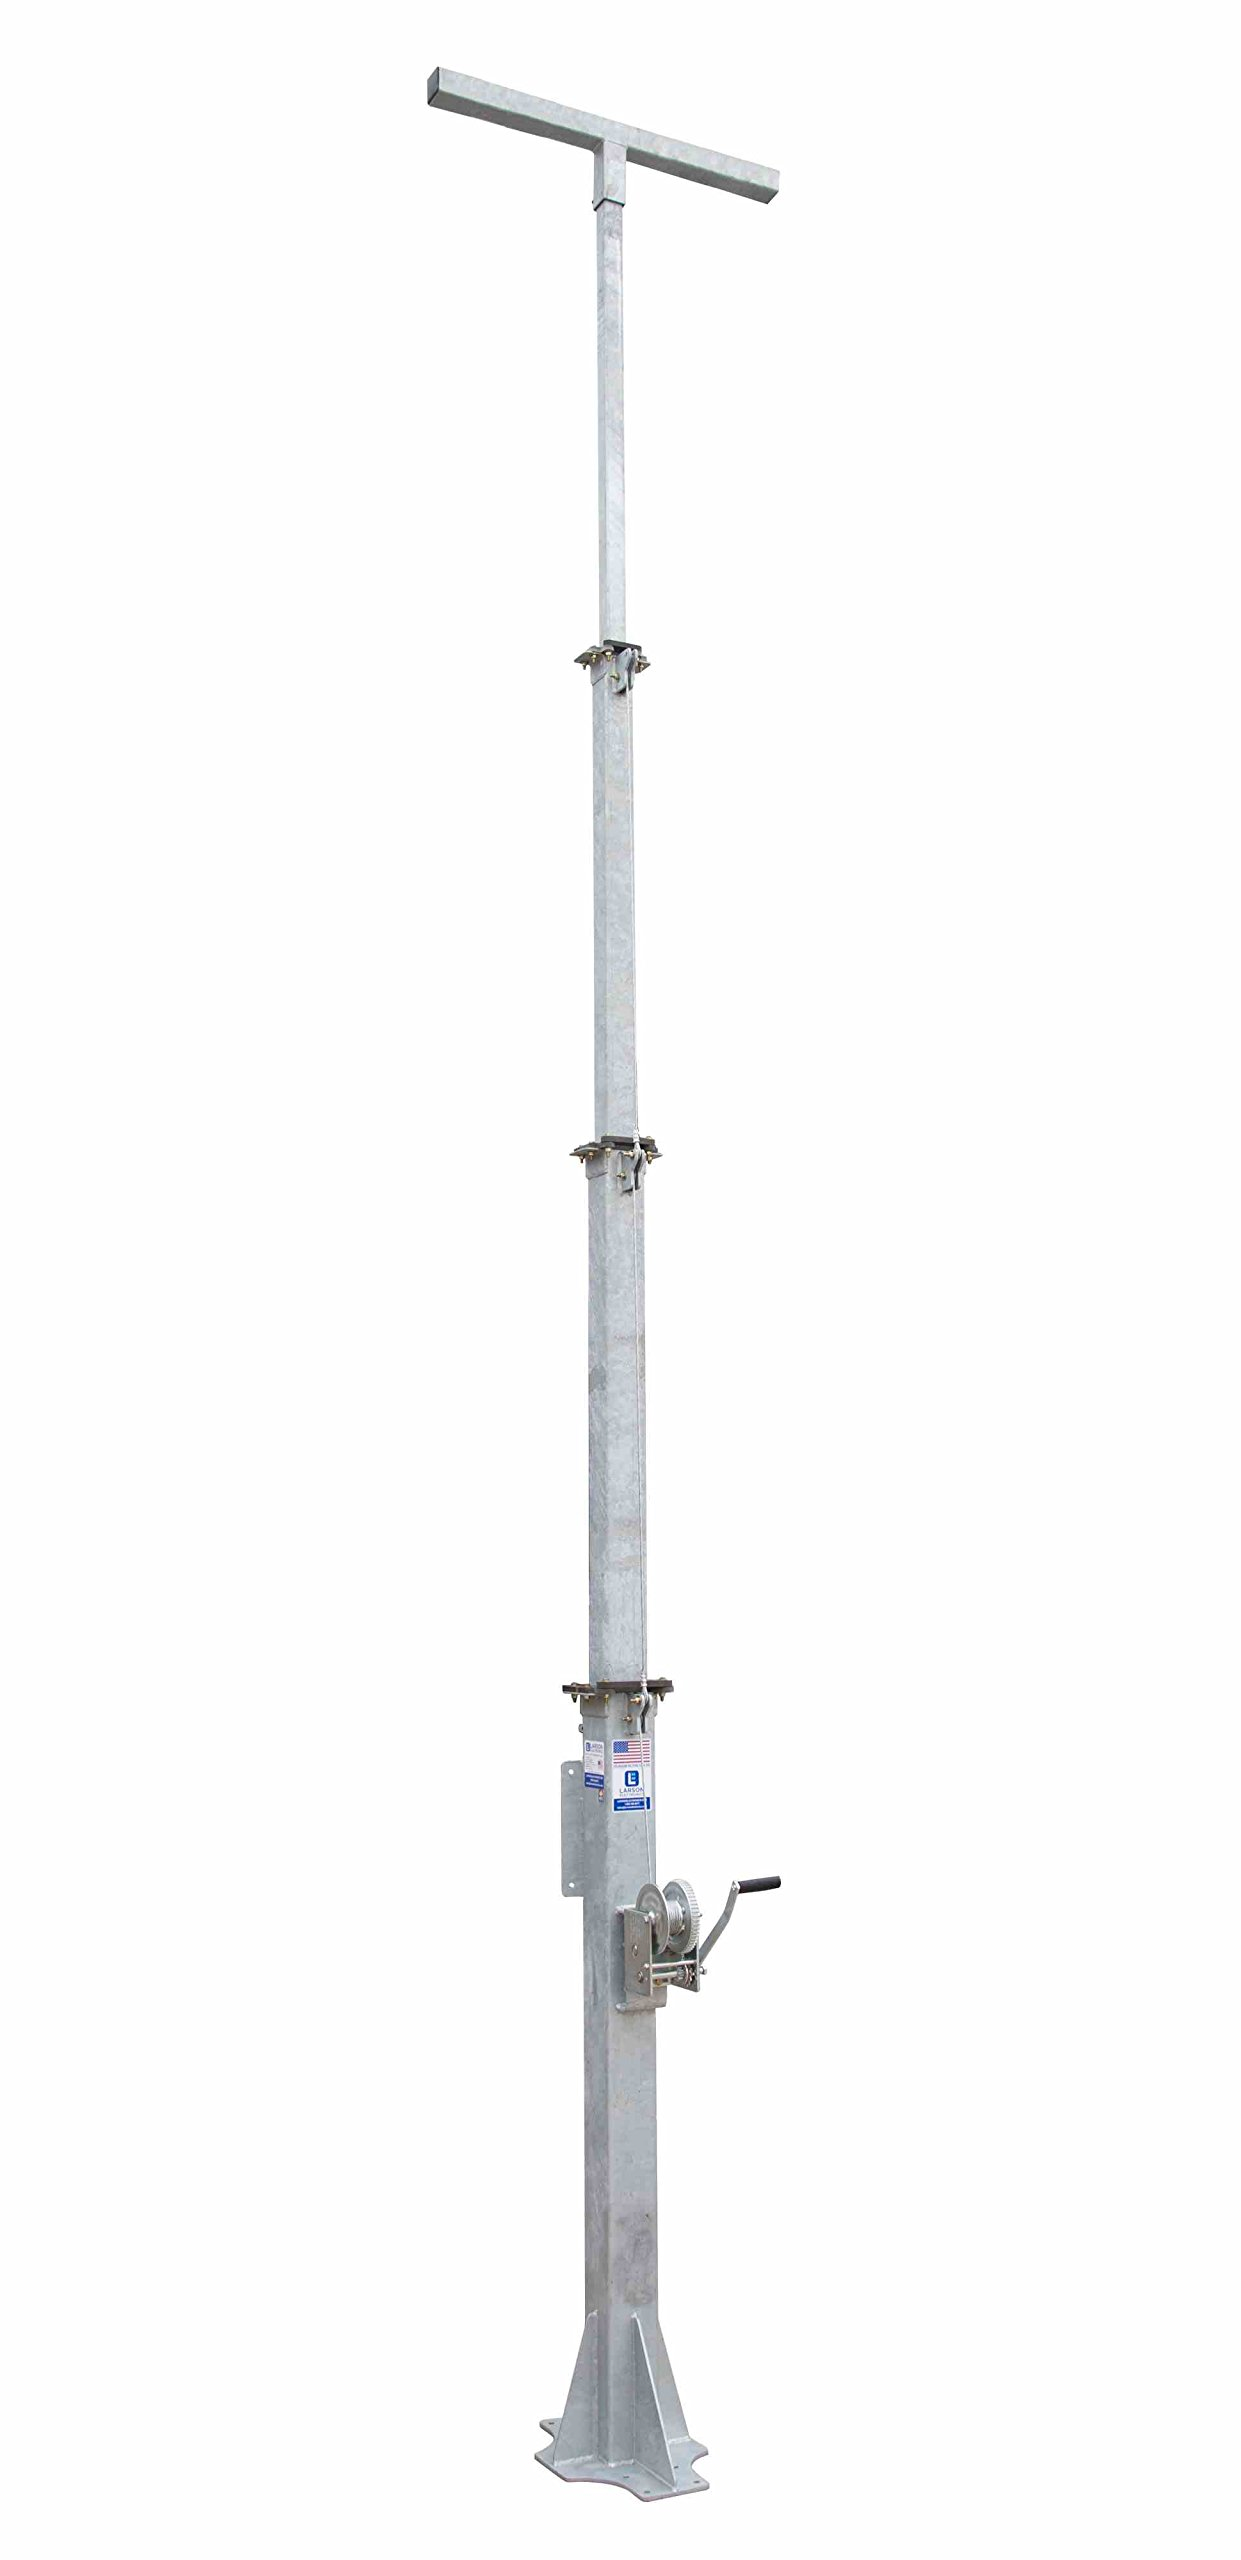 5-10' 3-Stage Light Mast - Cord Reel Mounting Plate - T-Head Mast Plate